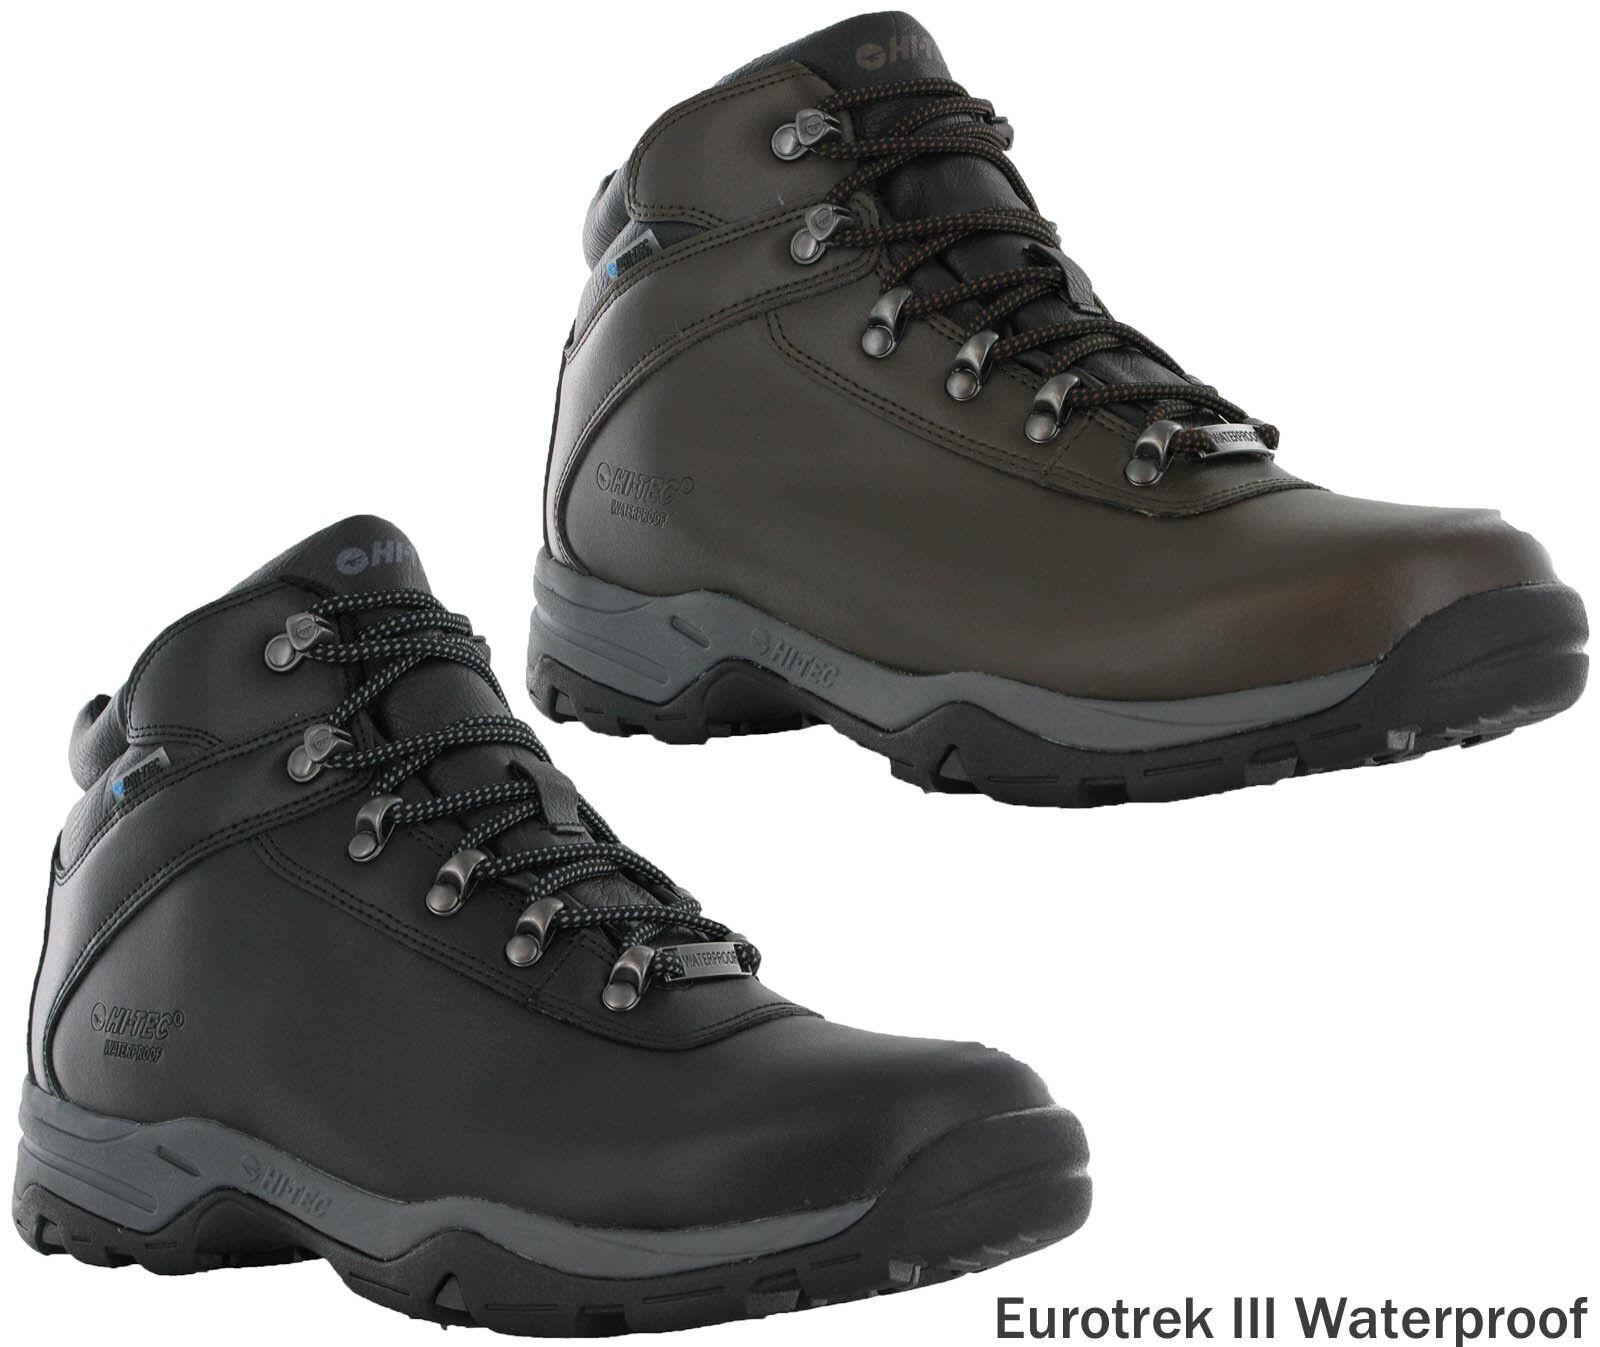 b543182fb8e Details about Hi-Tec Eurotrek III Leather Walking Hiking Trail Waterproof  Outdoor Boots Mens